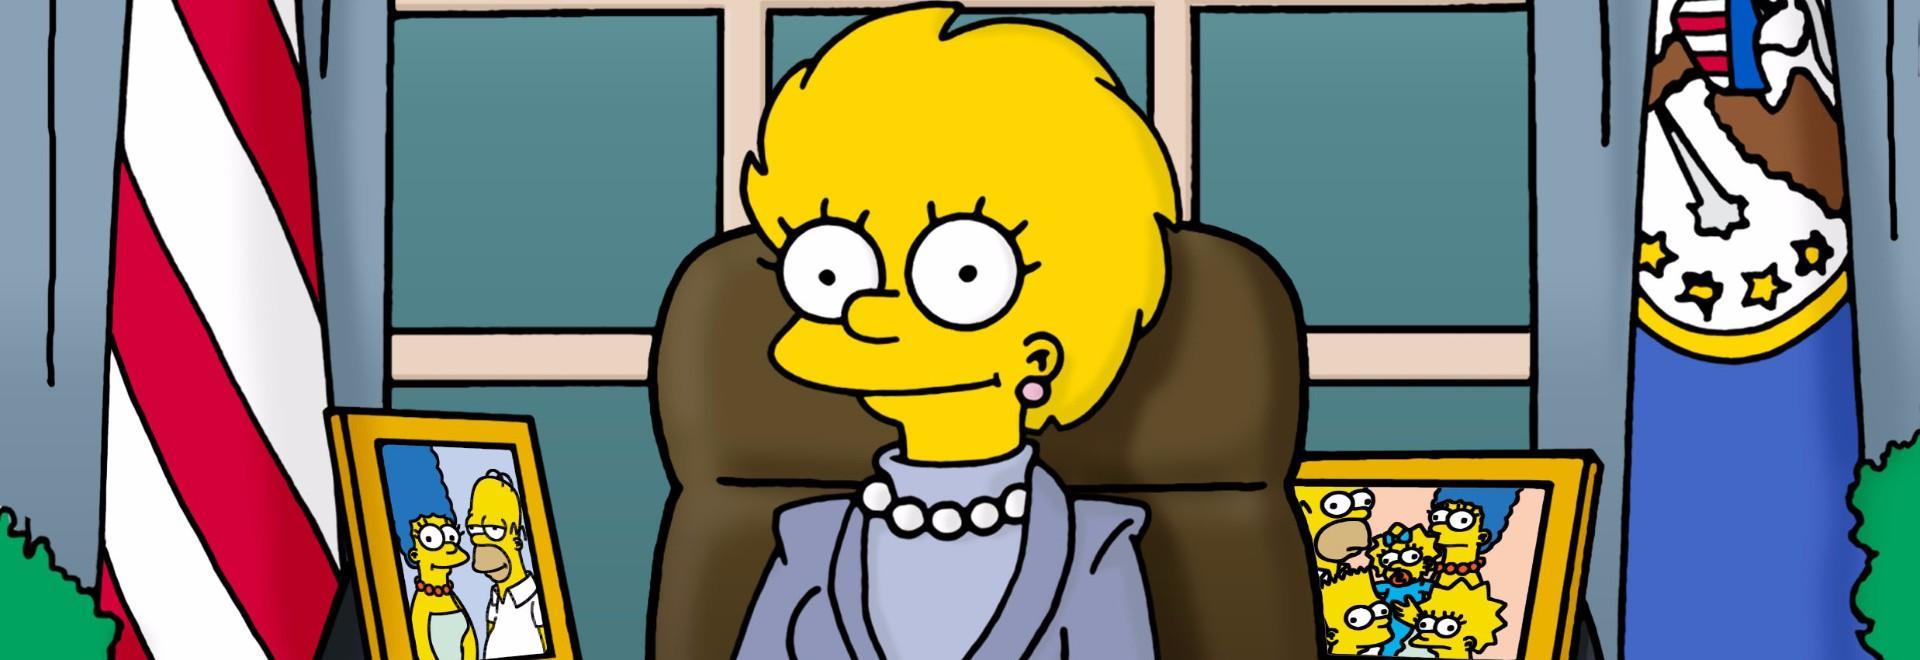 Questa pazza pazza pazza pazza Marge